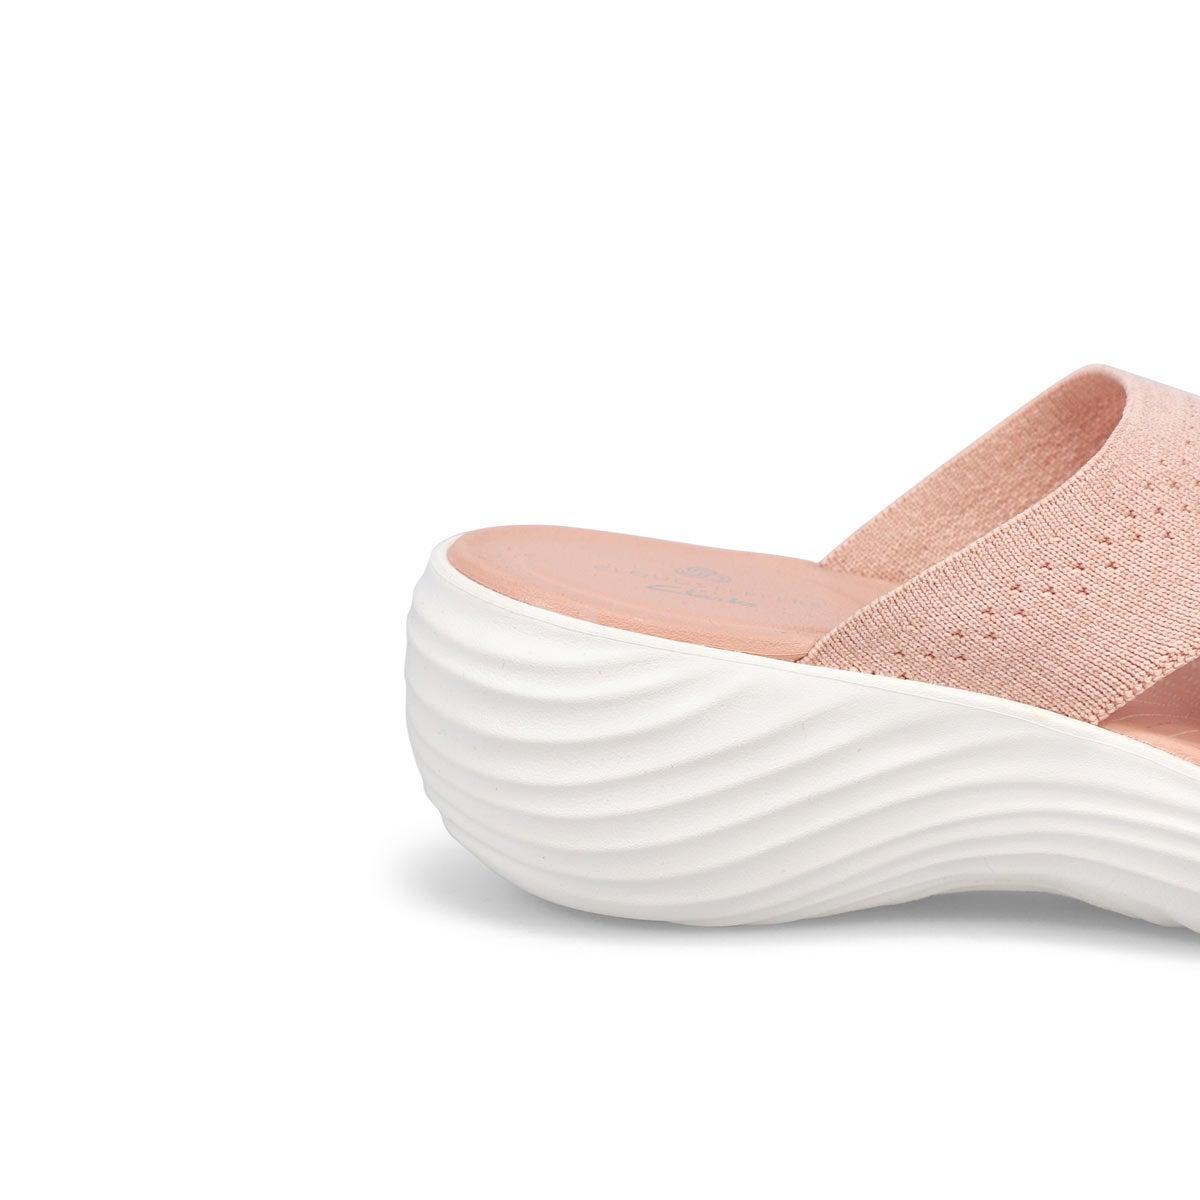 Sandale Marin Coral rose clair, femme